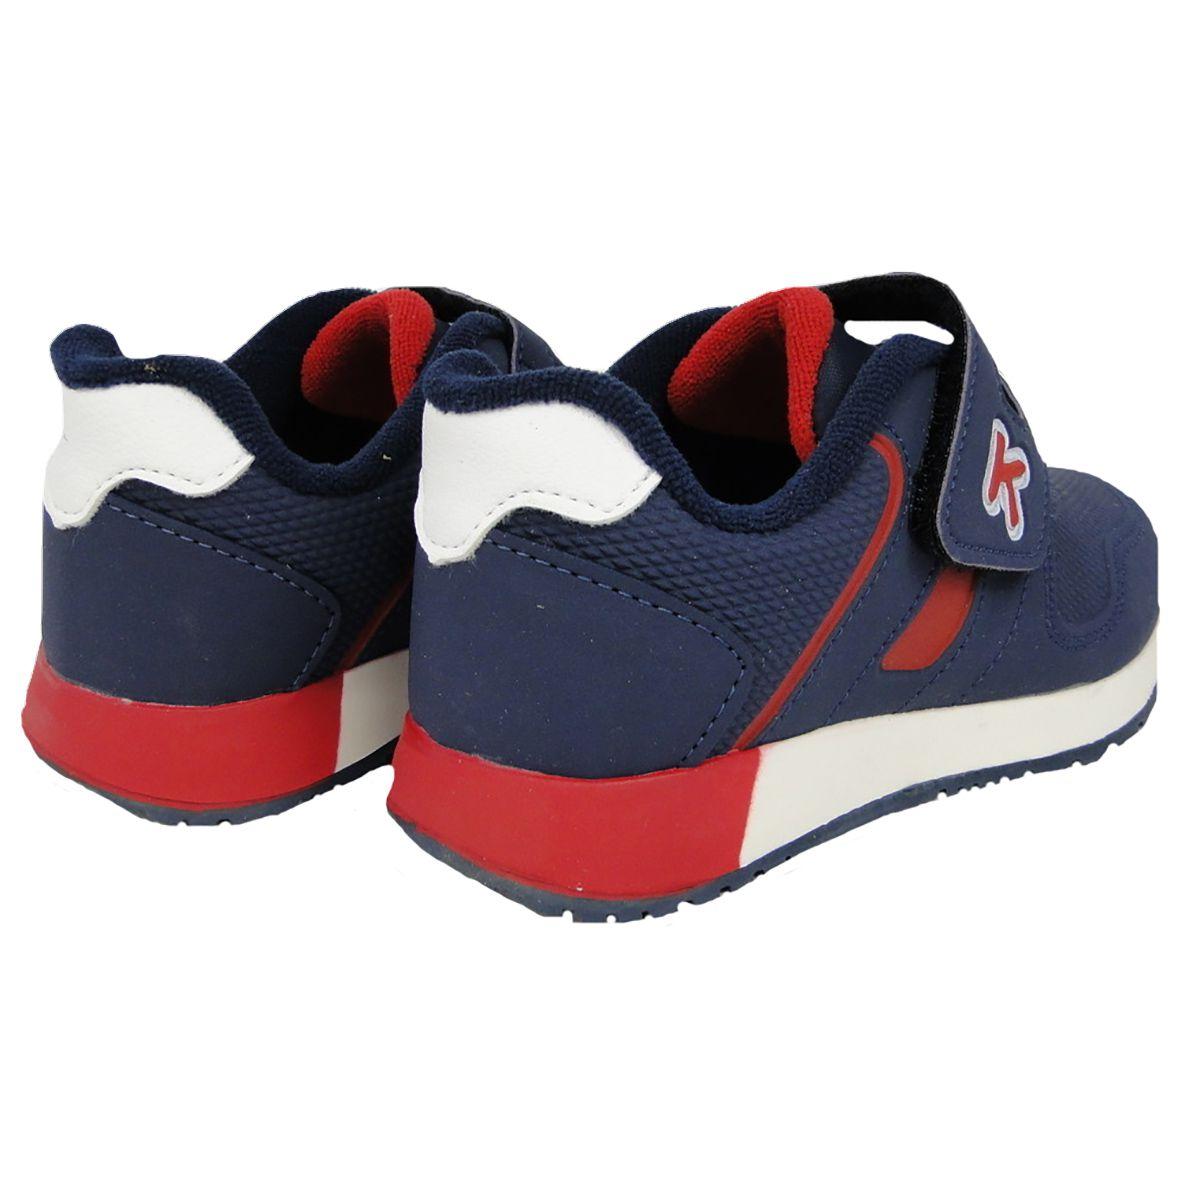 Tenis Klin Masculino Baby Walk Azul